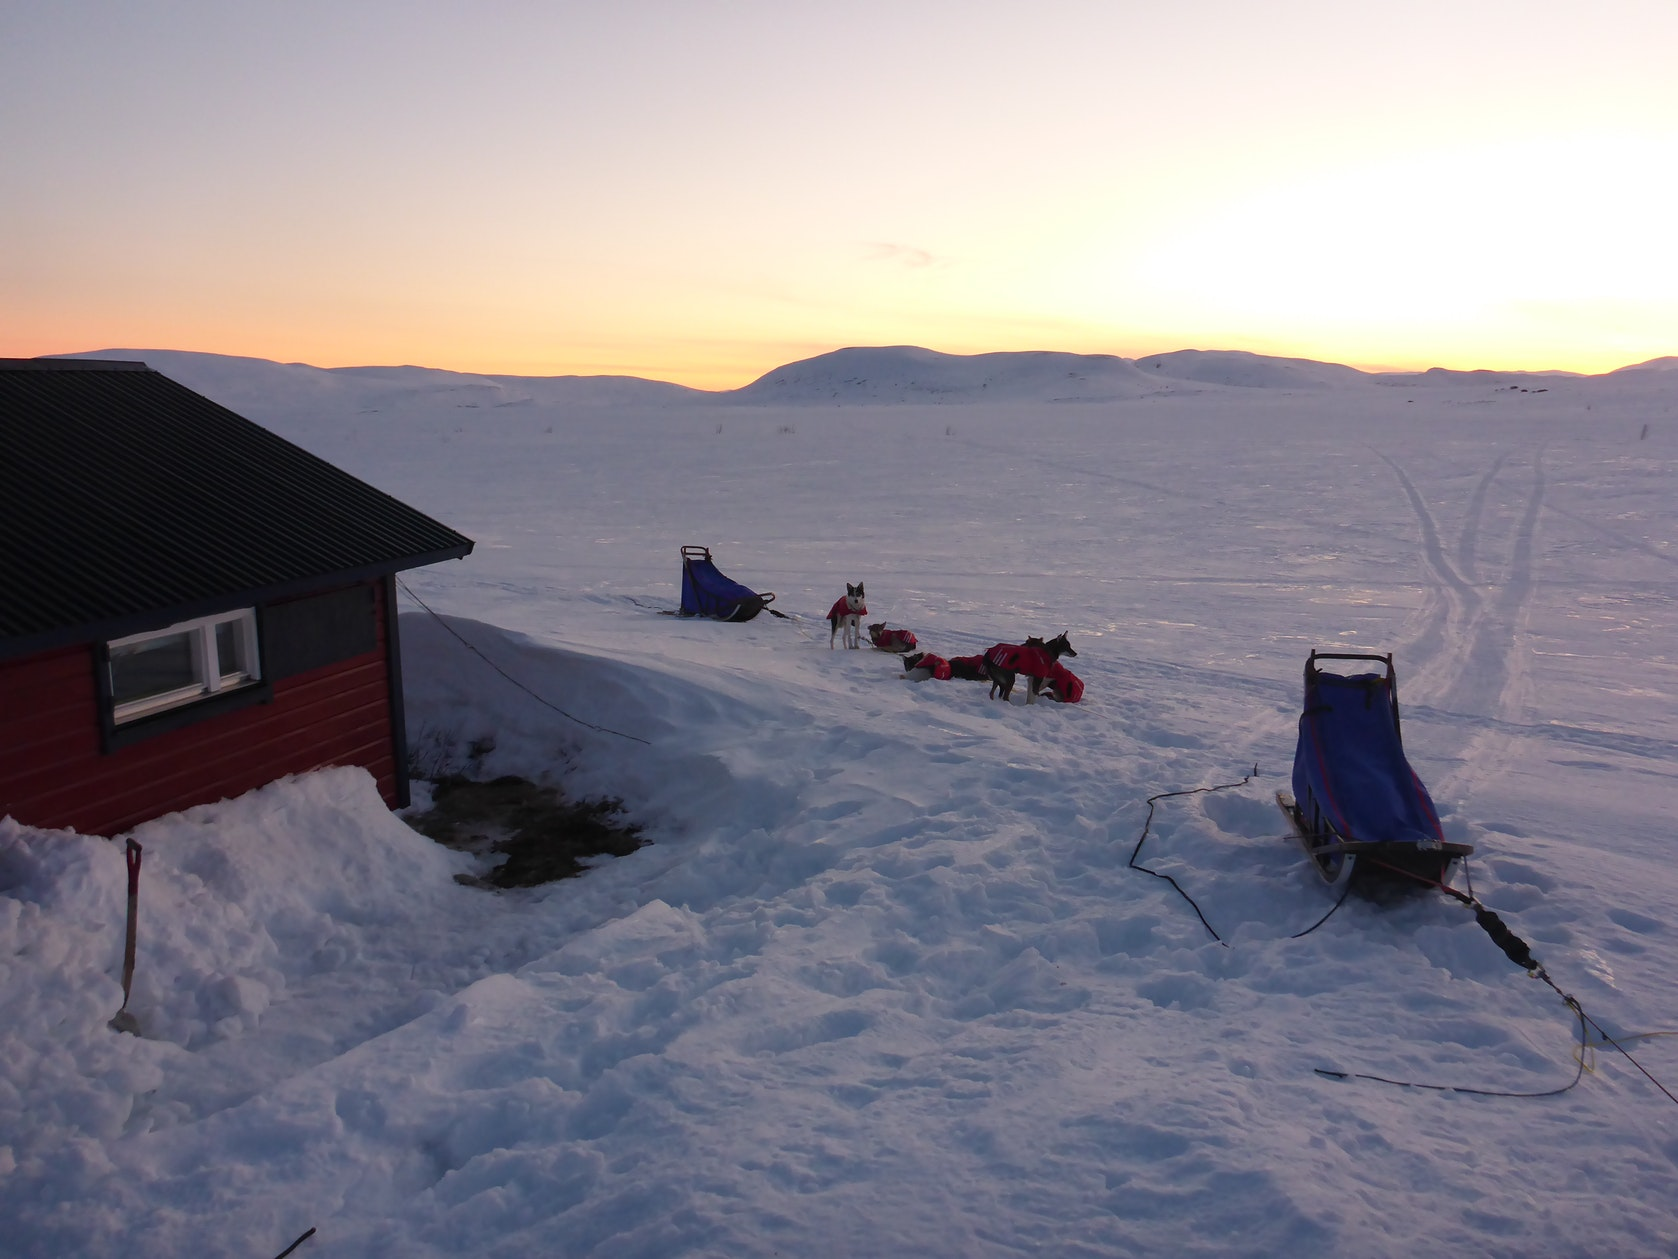 wintertour_mountaintour_arctic_5